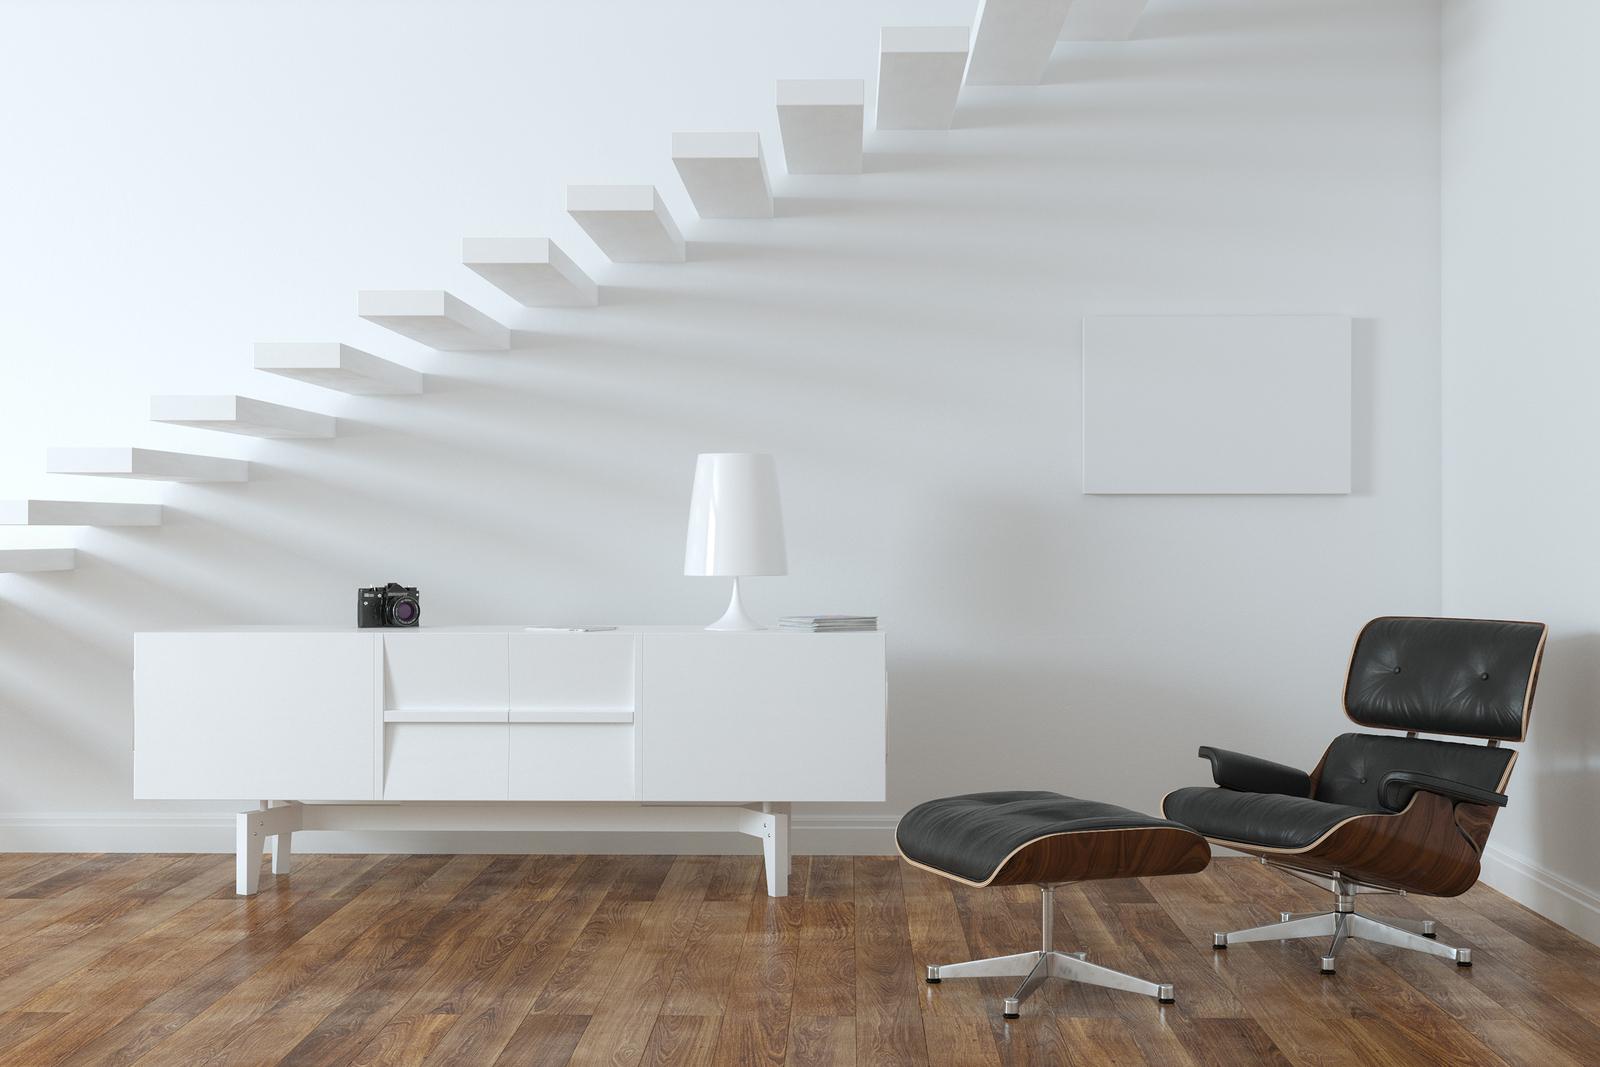 White Lounge Minimalistic Room With Upstairs (luxury interior)